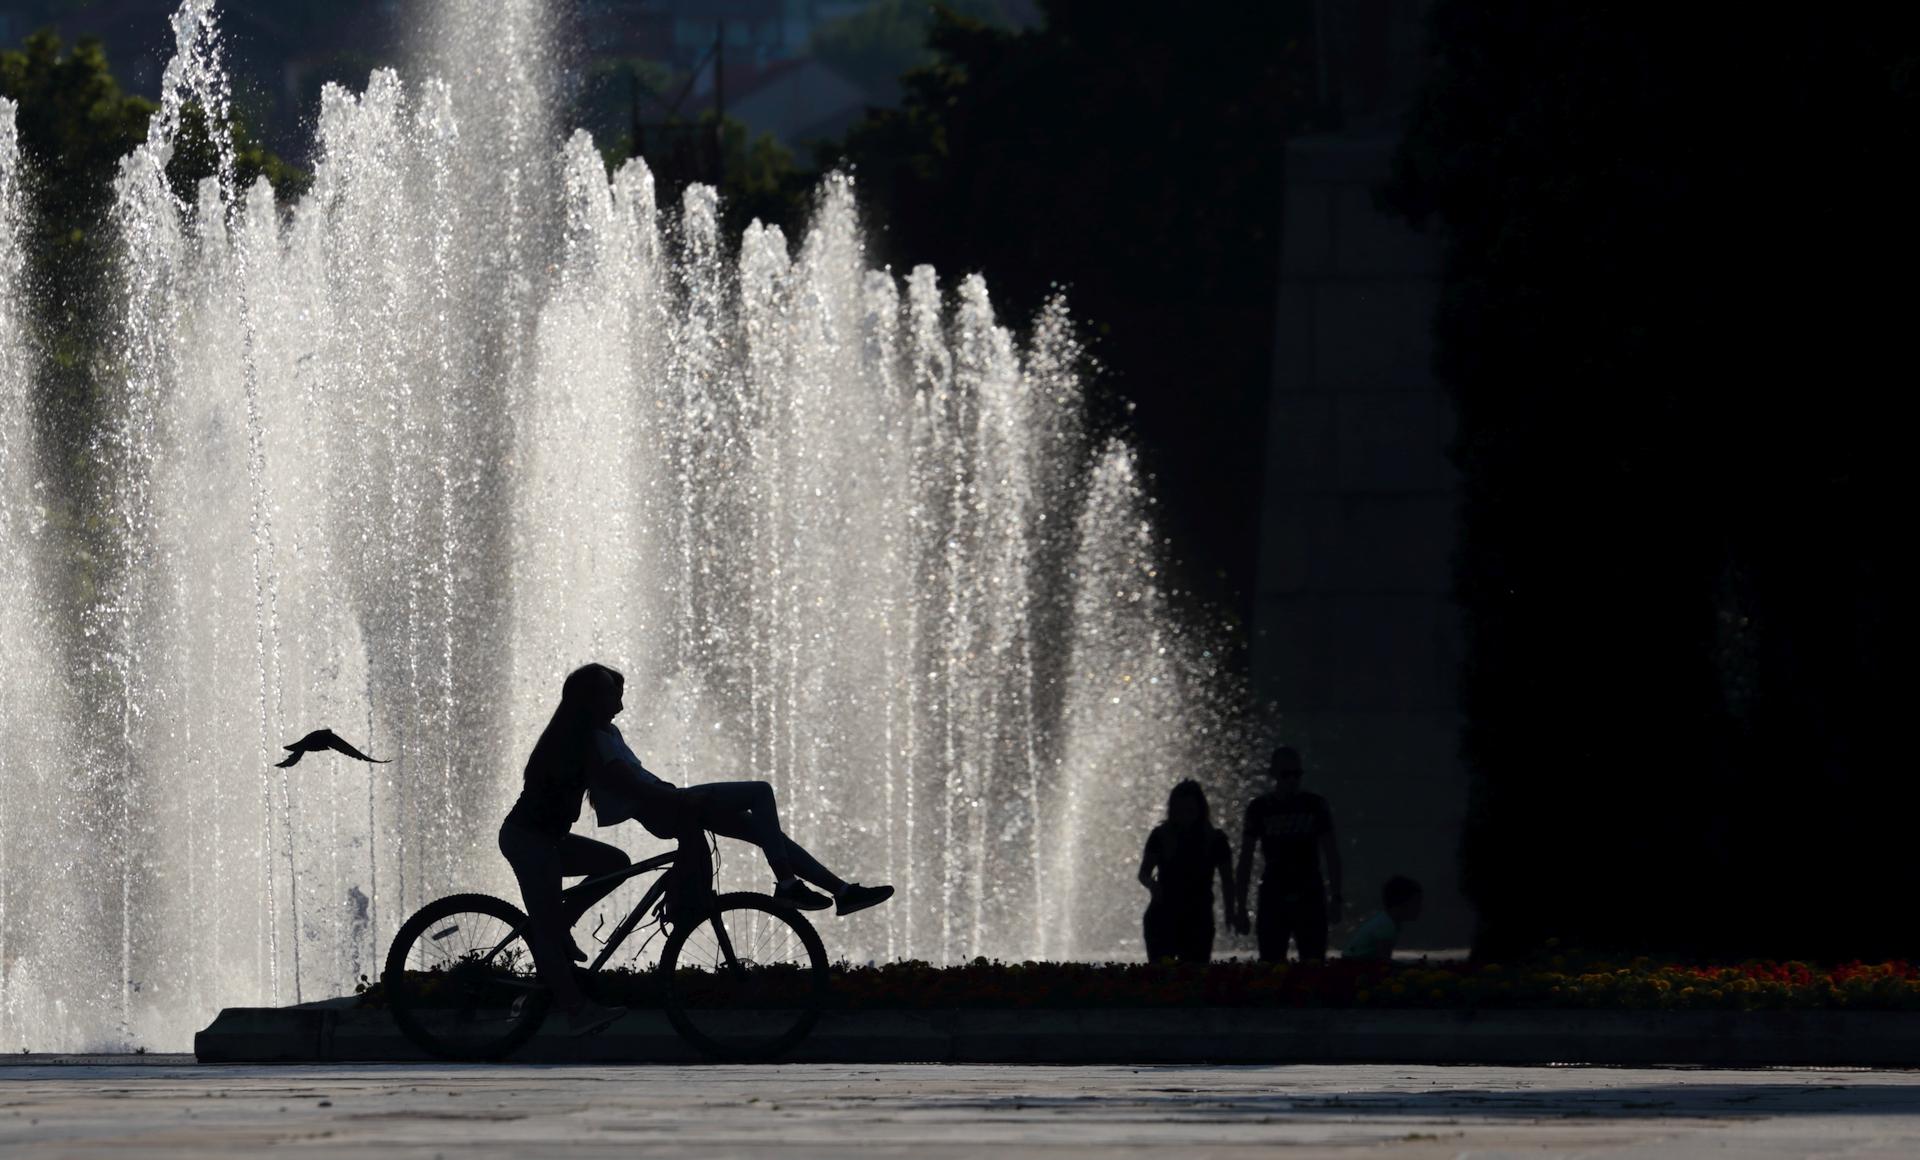 Около фонтаните...   Author Lyubomir Vassilev - LinkBeat   PHOTO FORUM